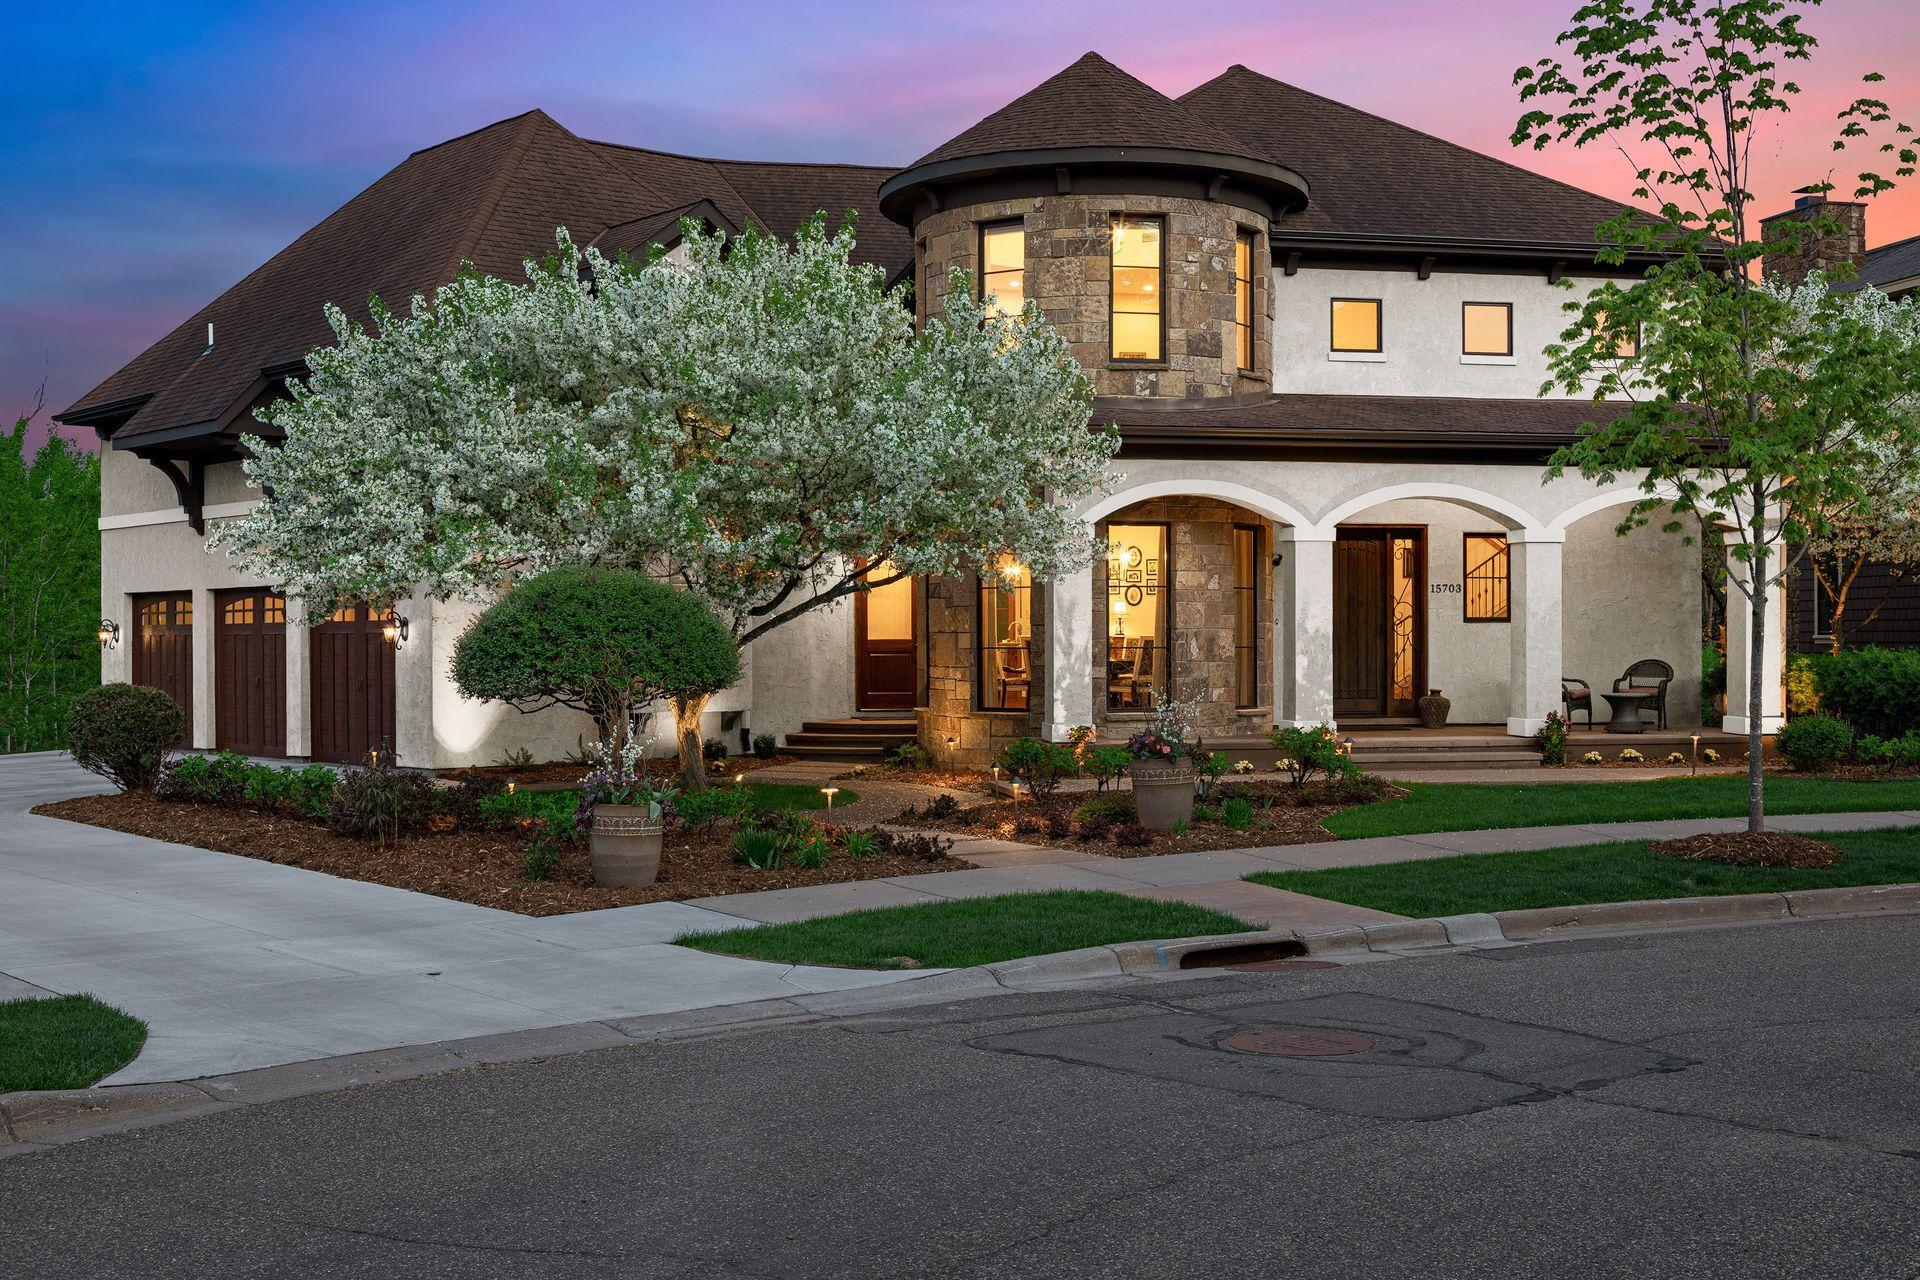 15703 Portico Drive Property Photo - Minnetonka, MN real estate listing